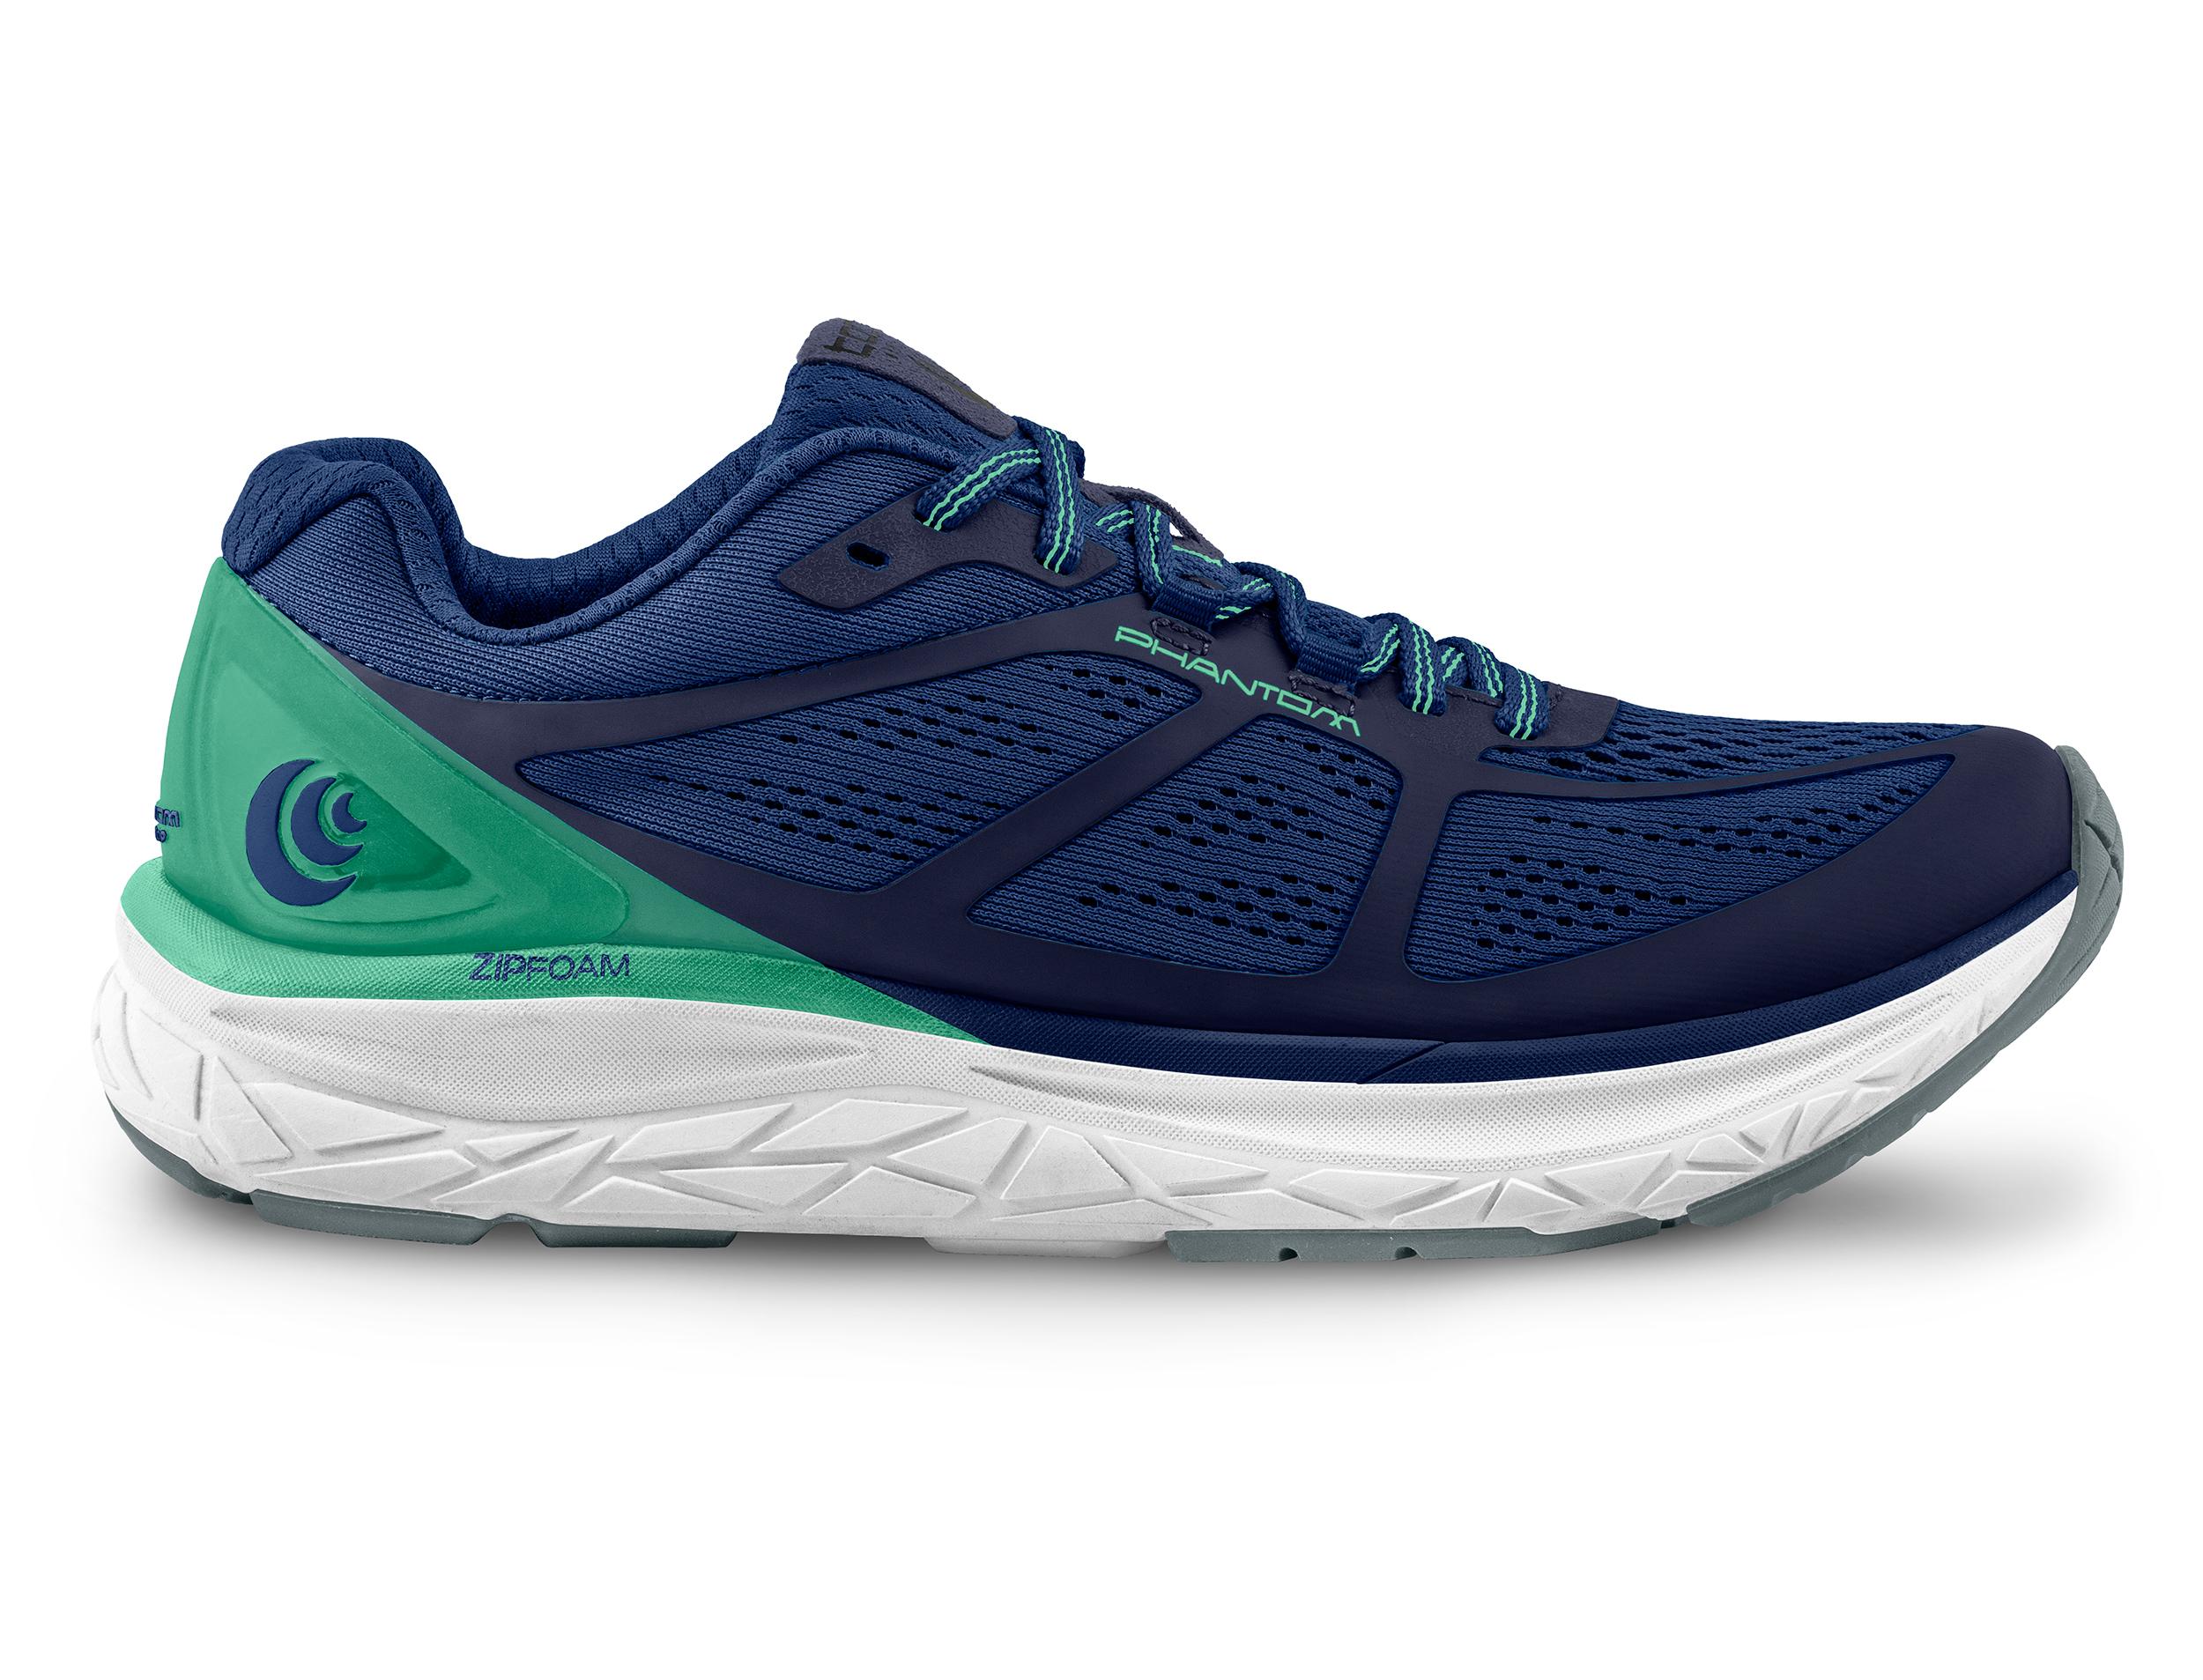 new concept 0c013 3f8c5 Topo Athletic Phantom Road Running Shoes - Women's